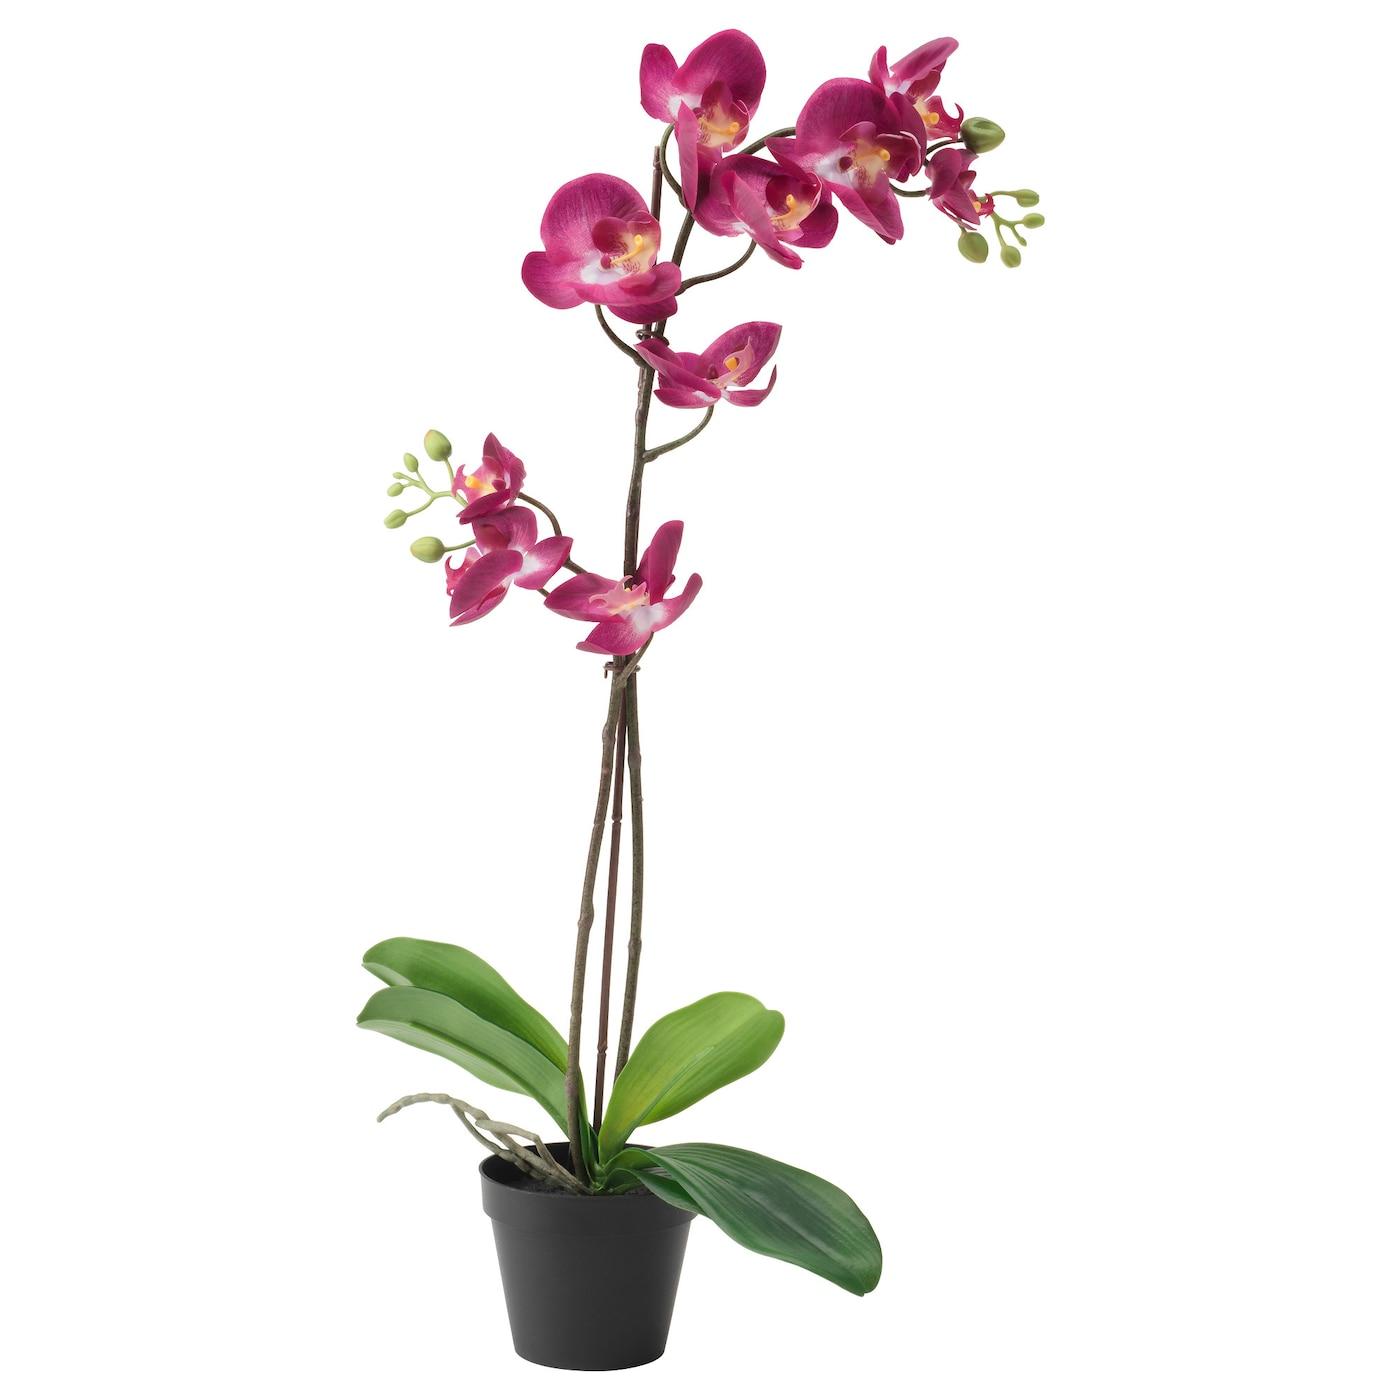 fejka plante artificielle en pot orchid e prune 12 cm ikea. Black Bedroom Furniture Sets. Home Design Ideas